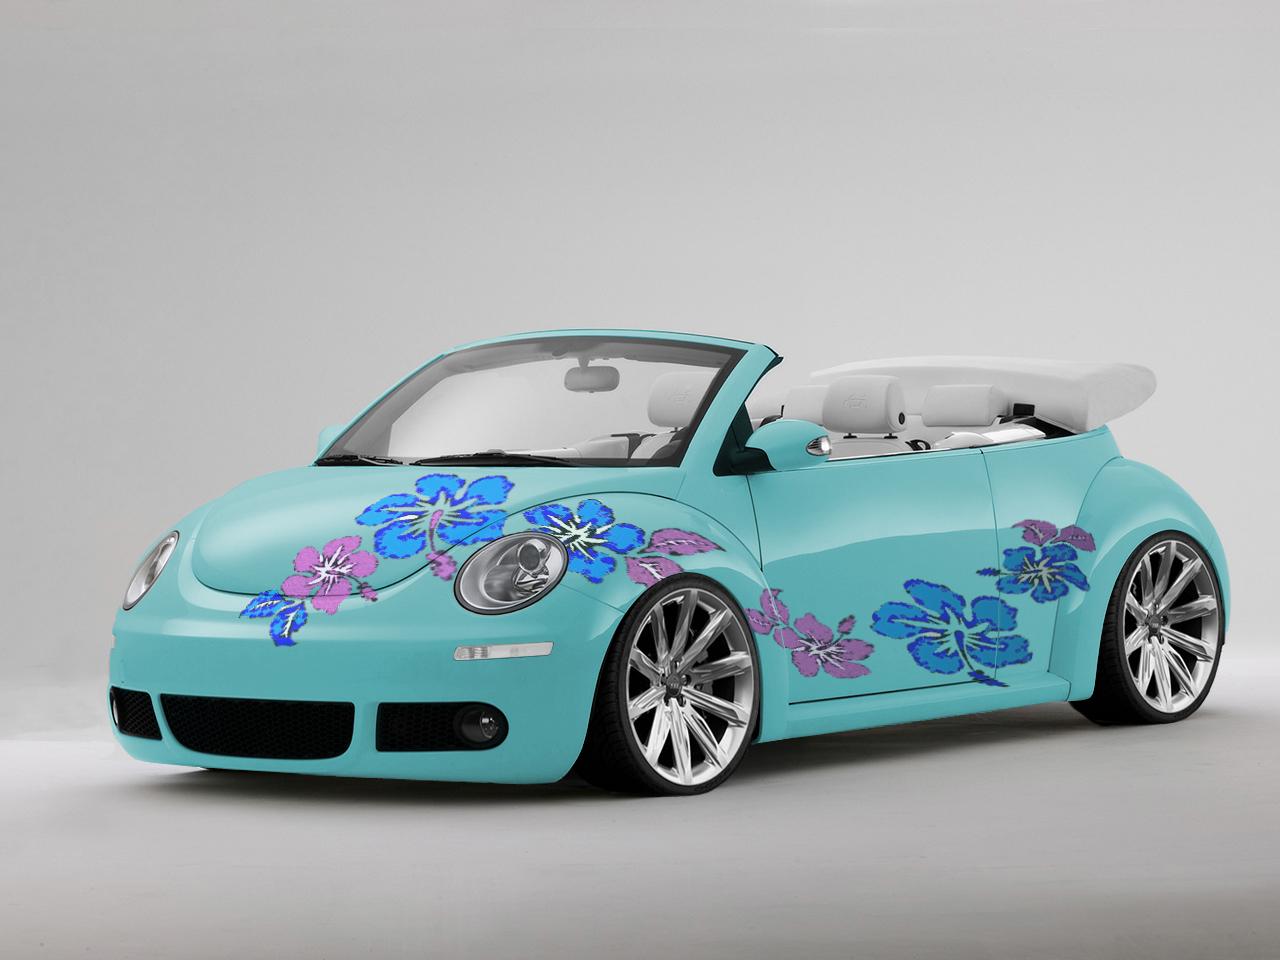 vw beetle deine automeile im netz. Black Bedroom Furniture Sets. Home Design Ideas